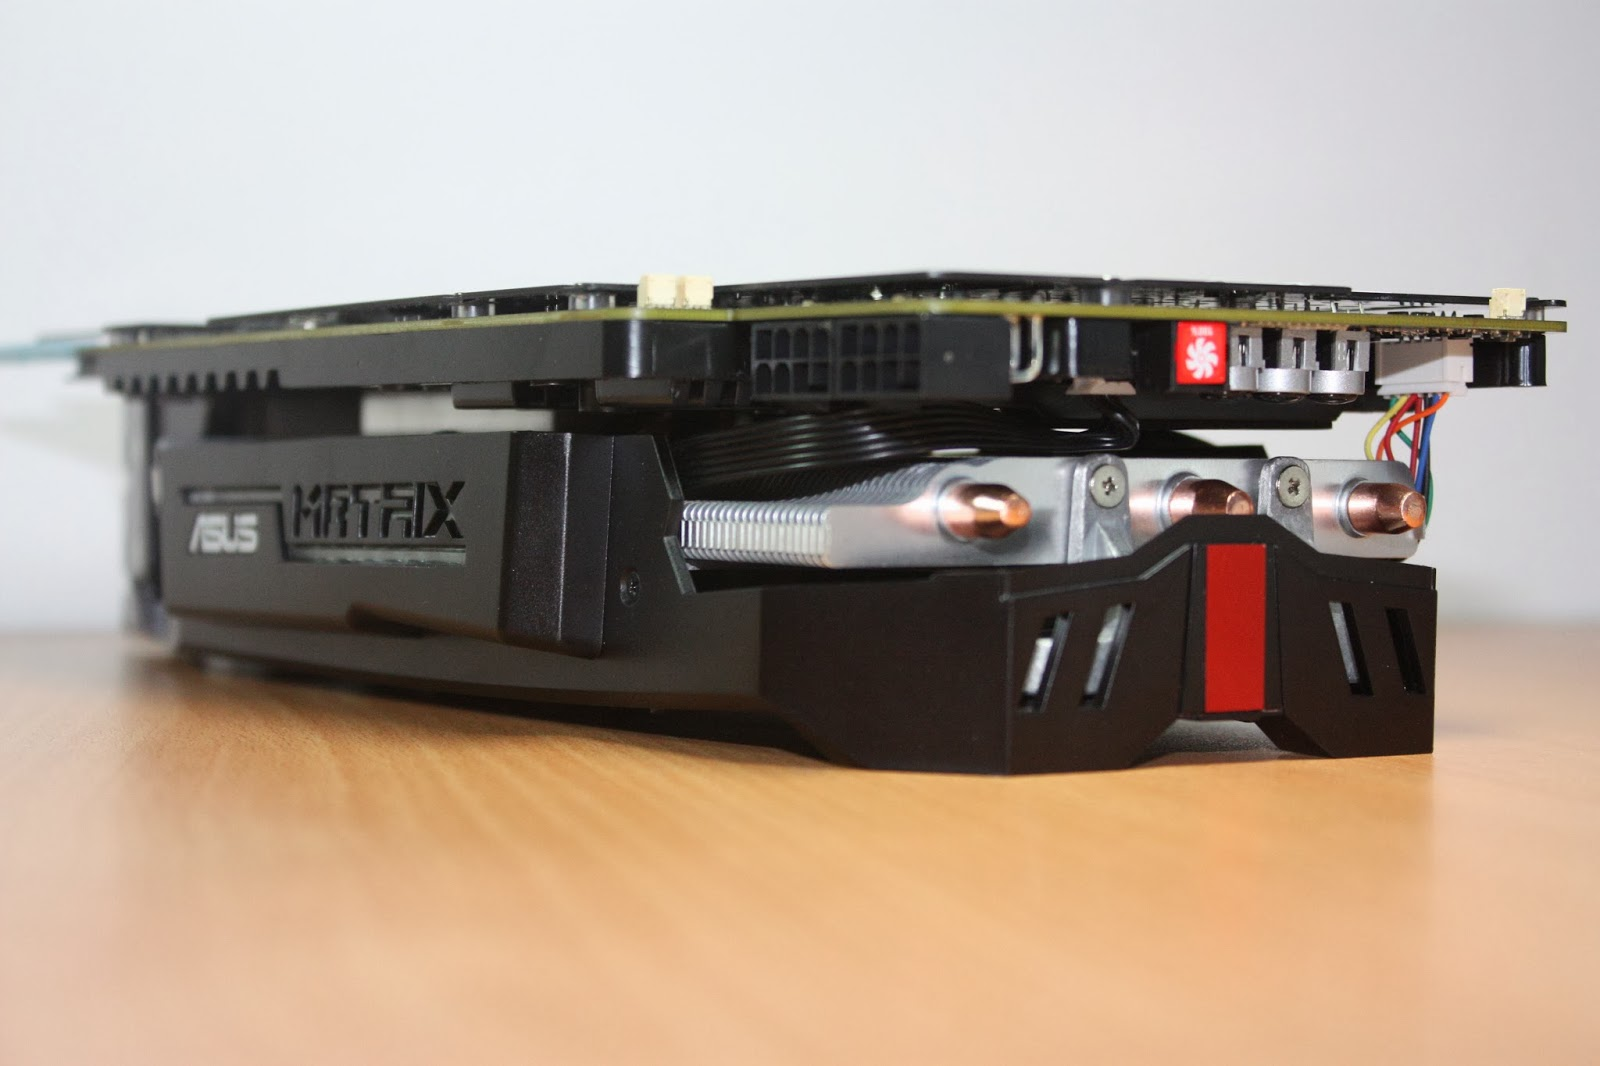 Graphics: [IMAGE HEAVY] Photoshoot of the ASUS Radeon R9